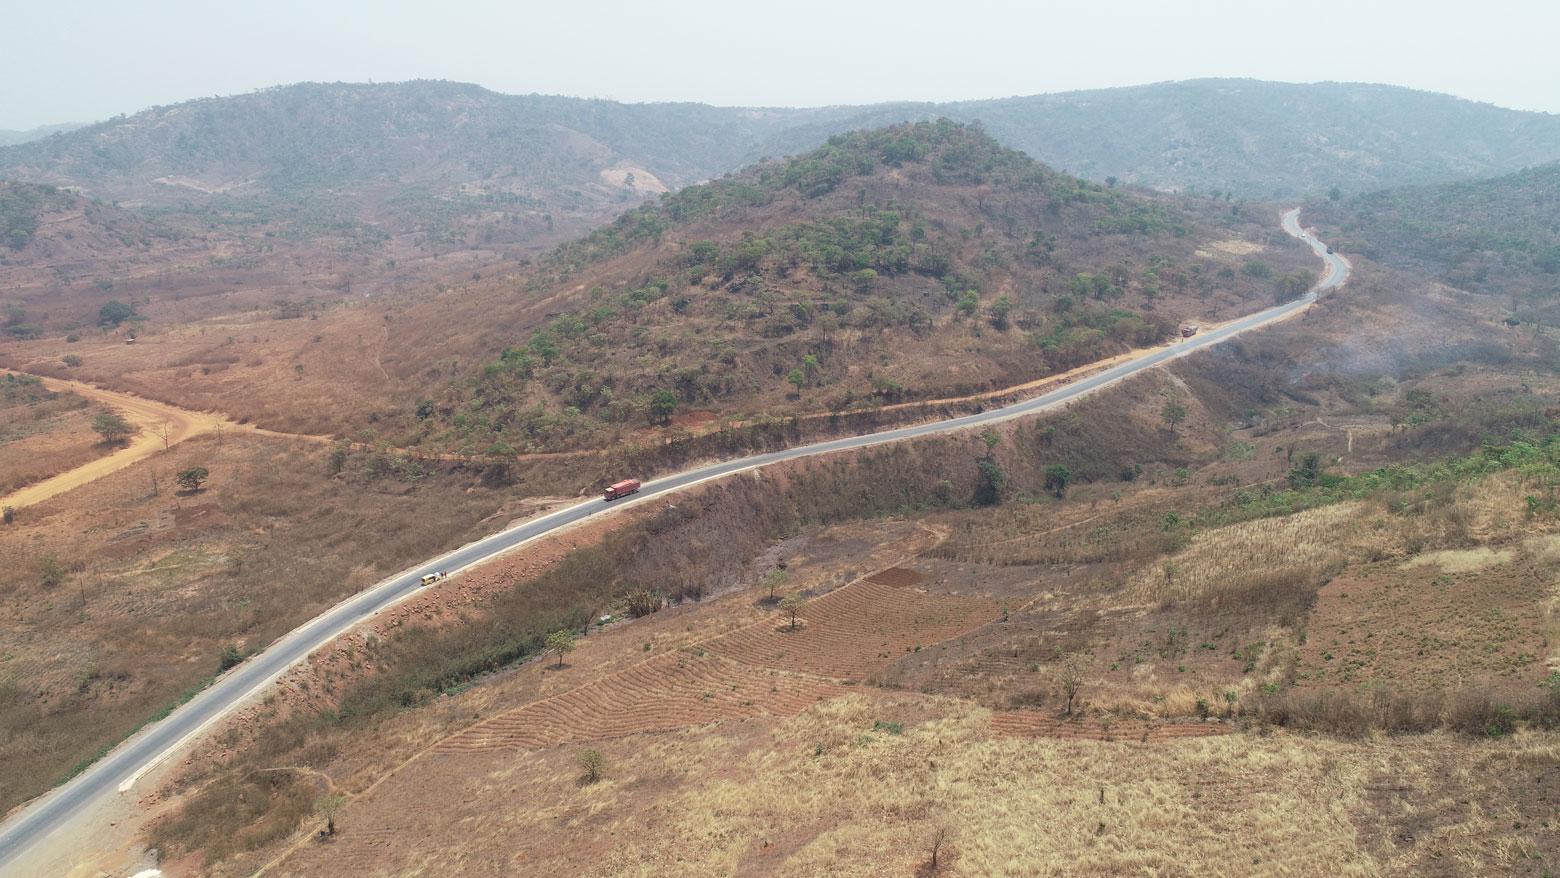 Paysage vallonné sur la route Likasi-Kambove